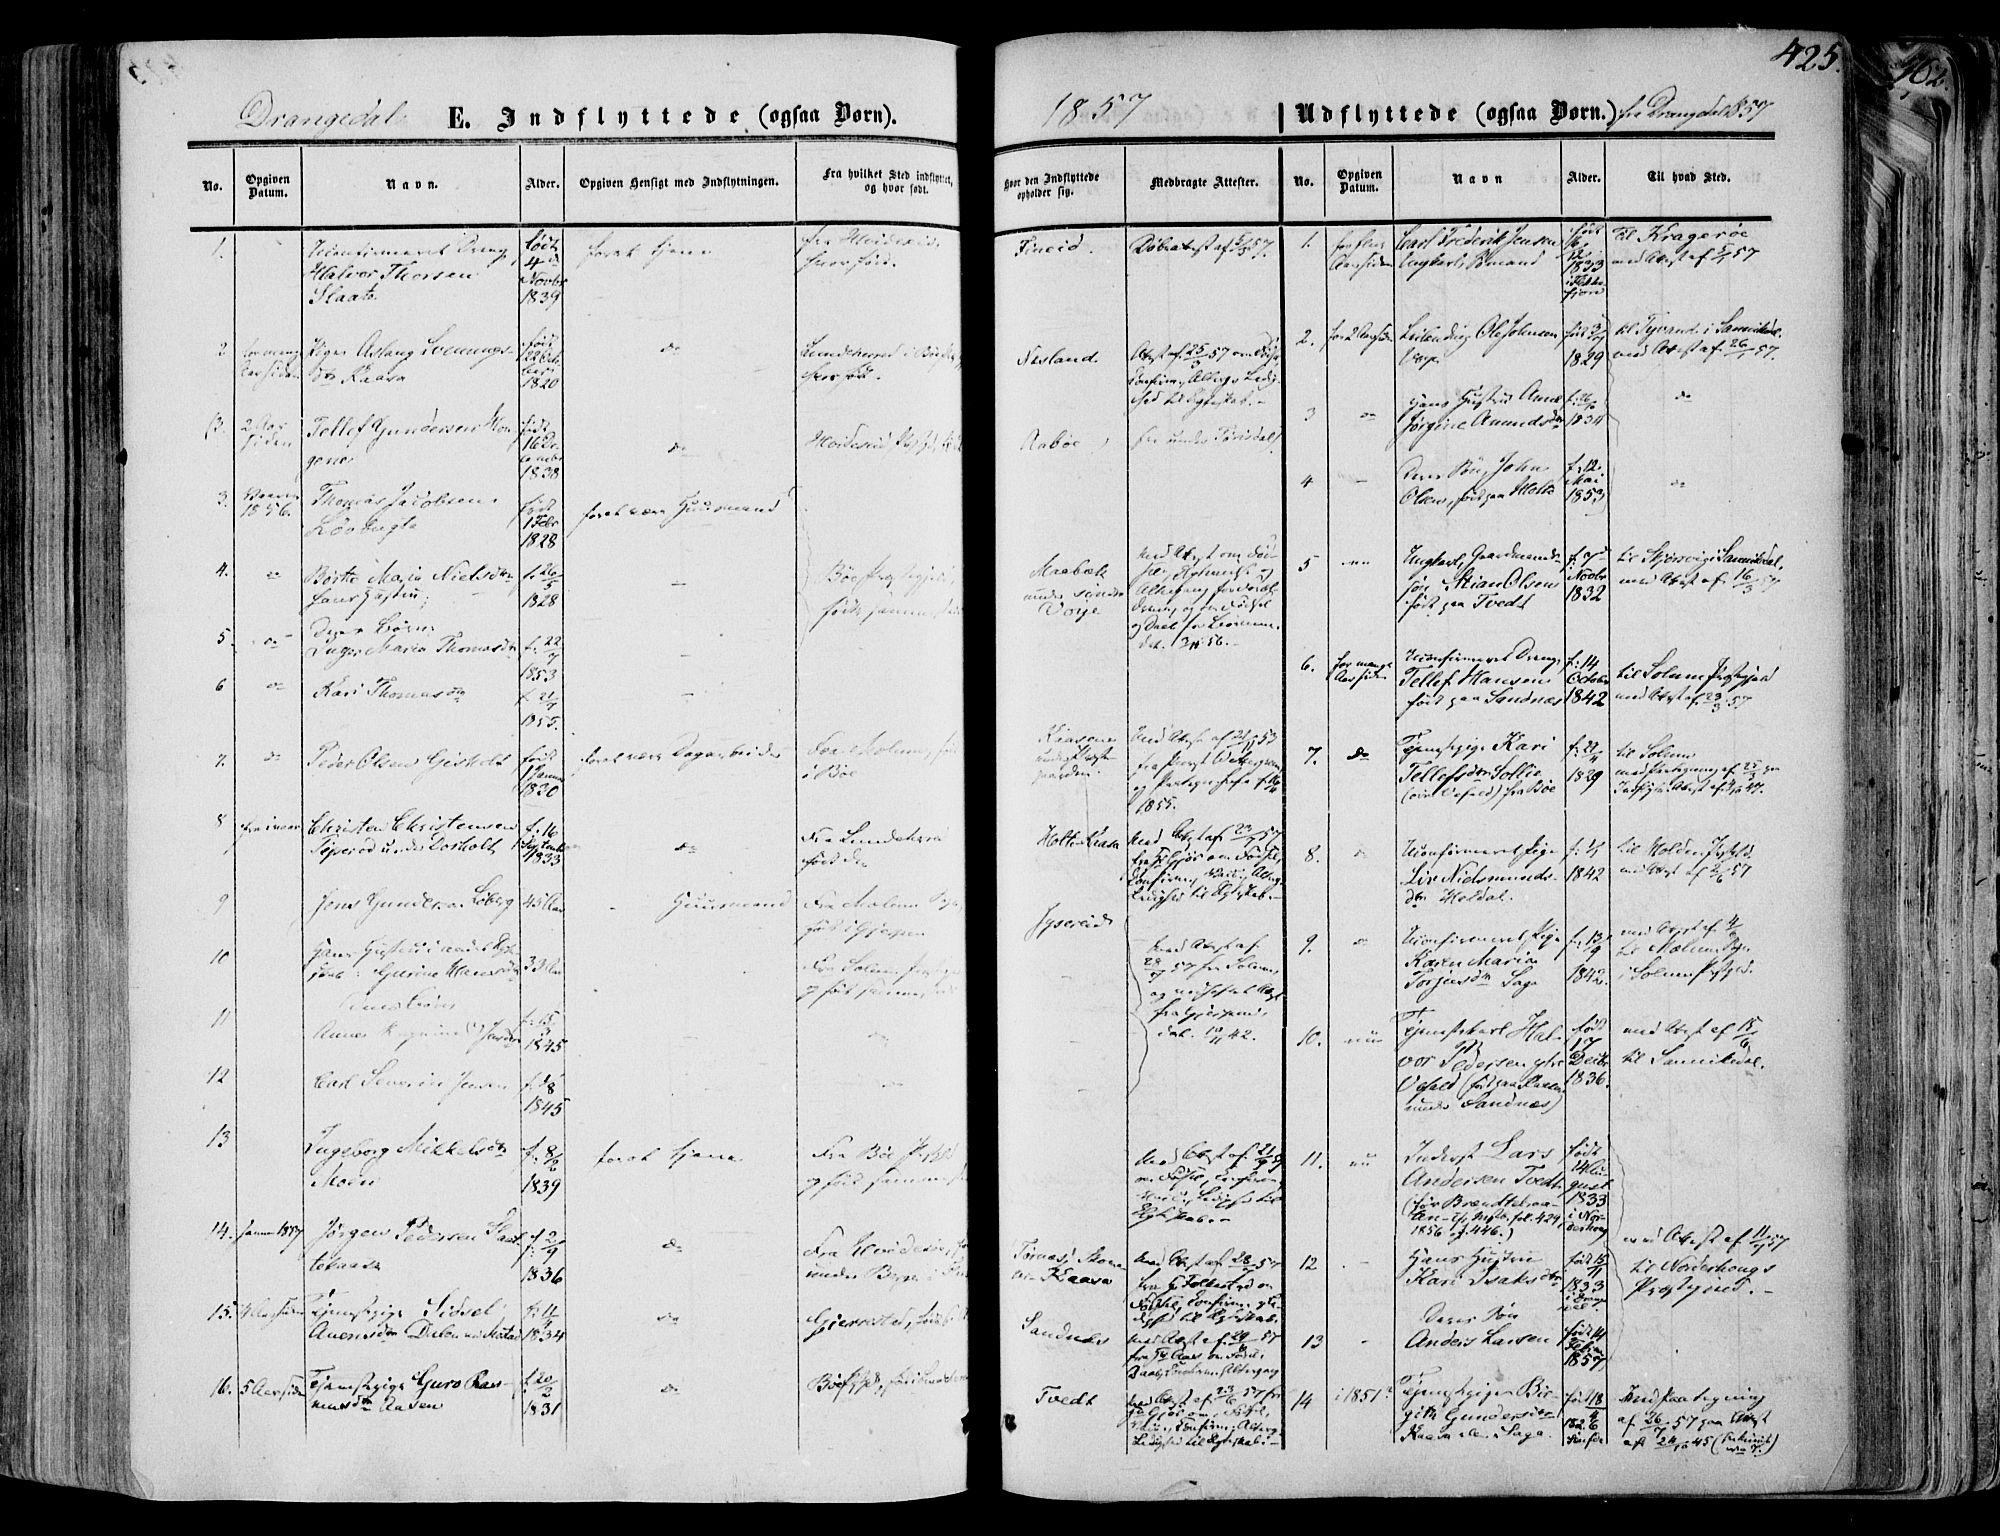 SAKO, Drangedal kirkebøker, F/Fa/L0008: Ministerialbok nr. 8, 1857-1871, s. 425